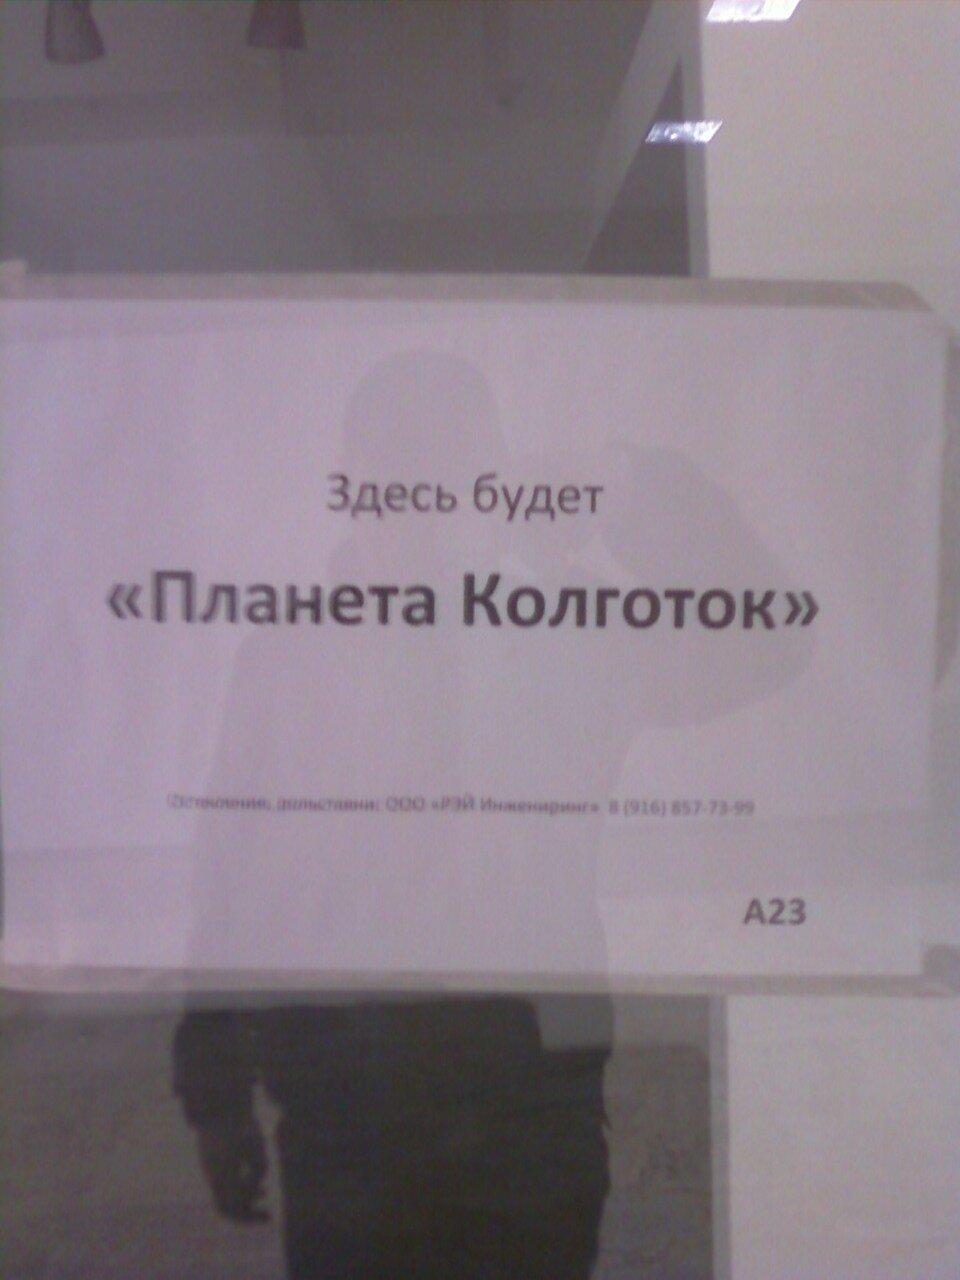 http://img-fotki.yandex.ru/get/4512/fotikavto.4/0_5cb80_e65046a6_XXXL.jpg